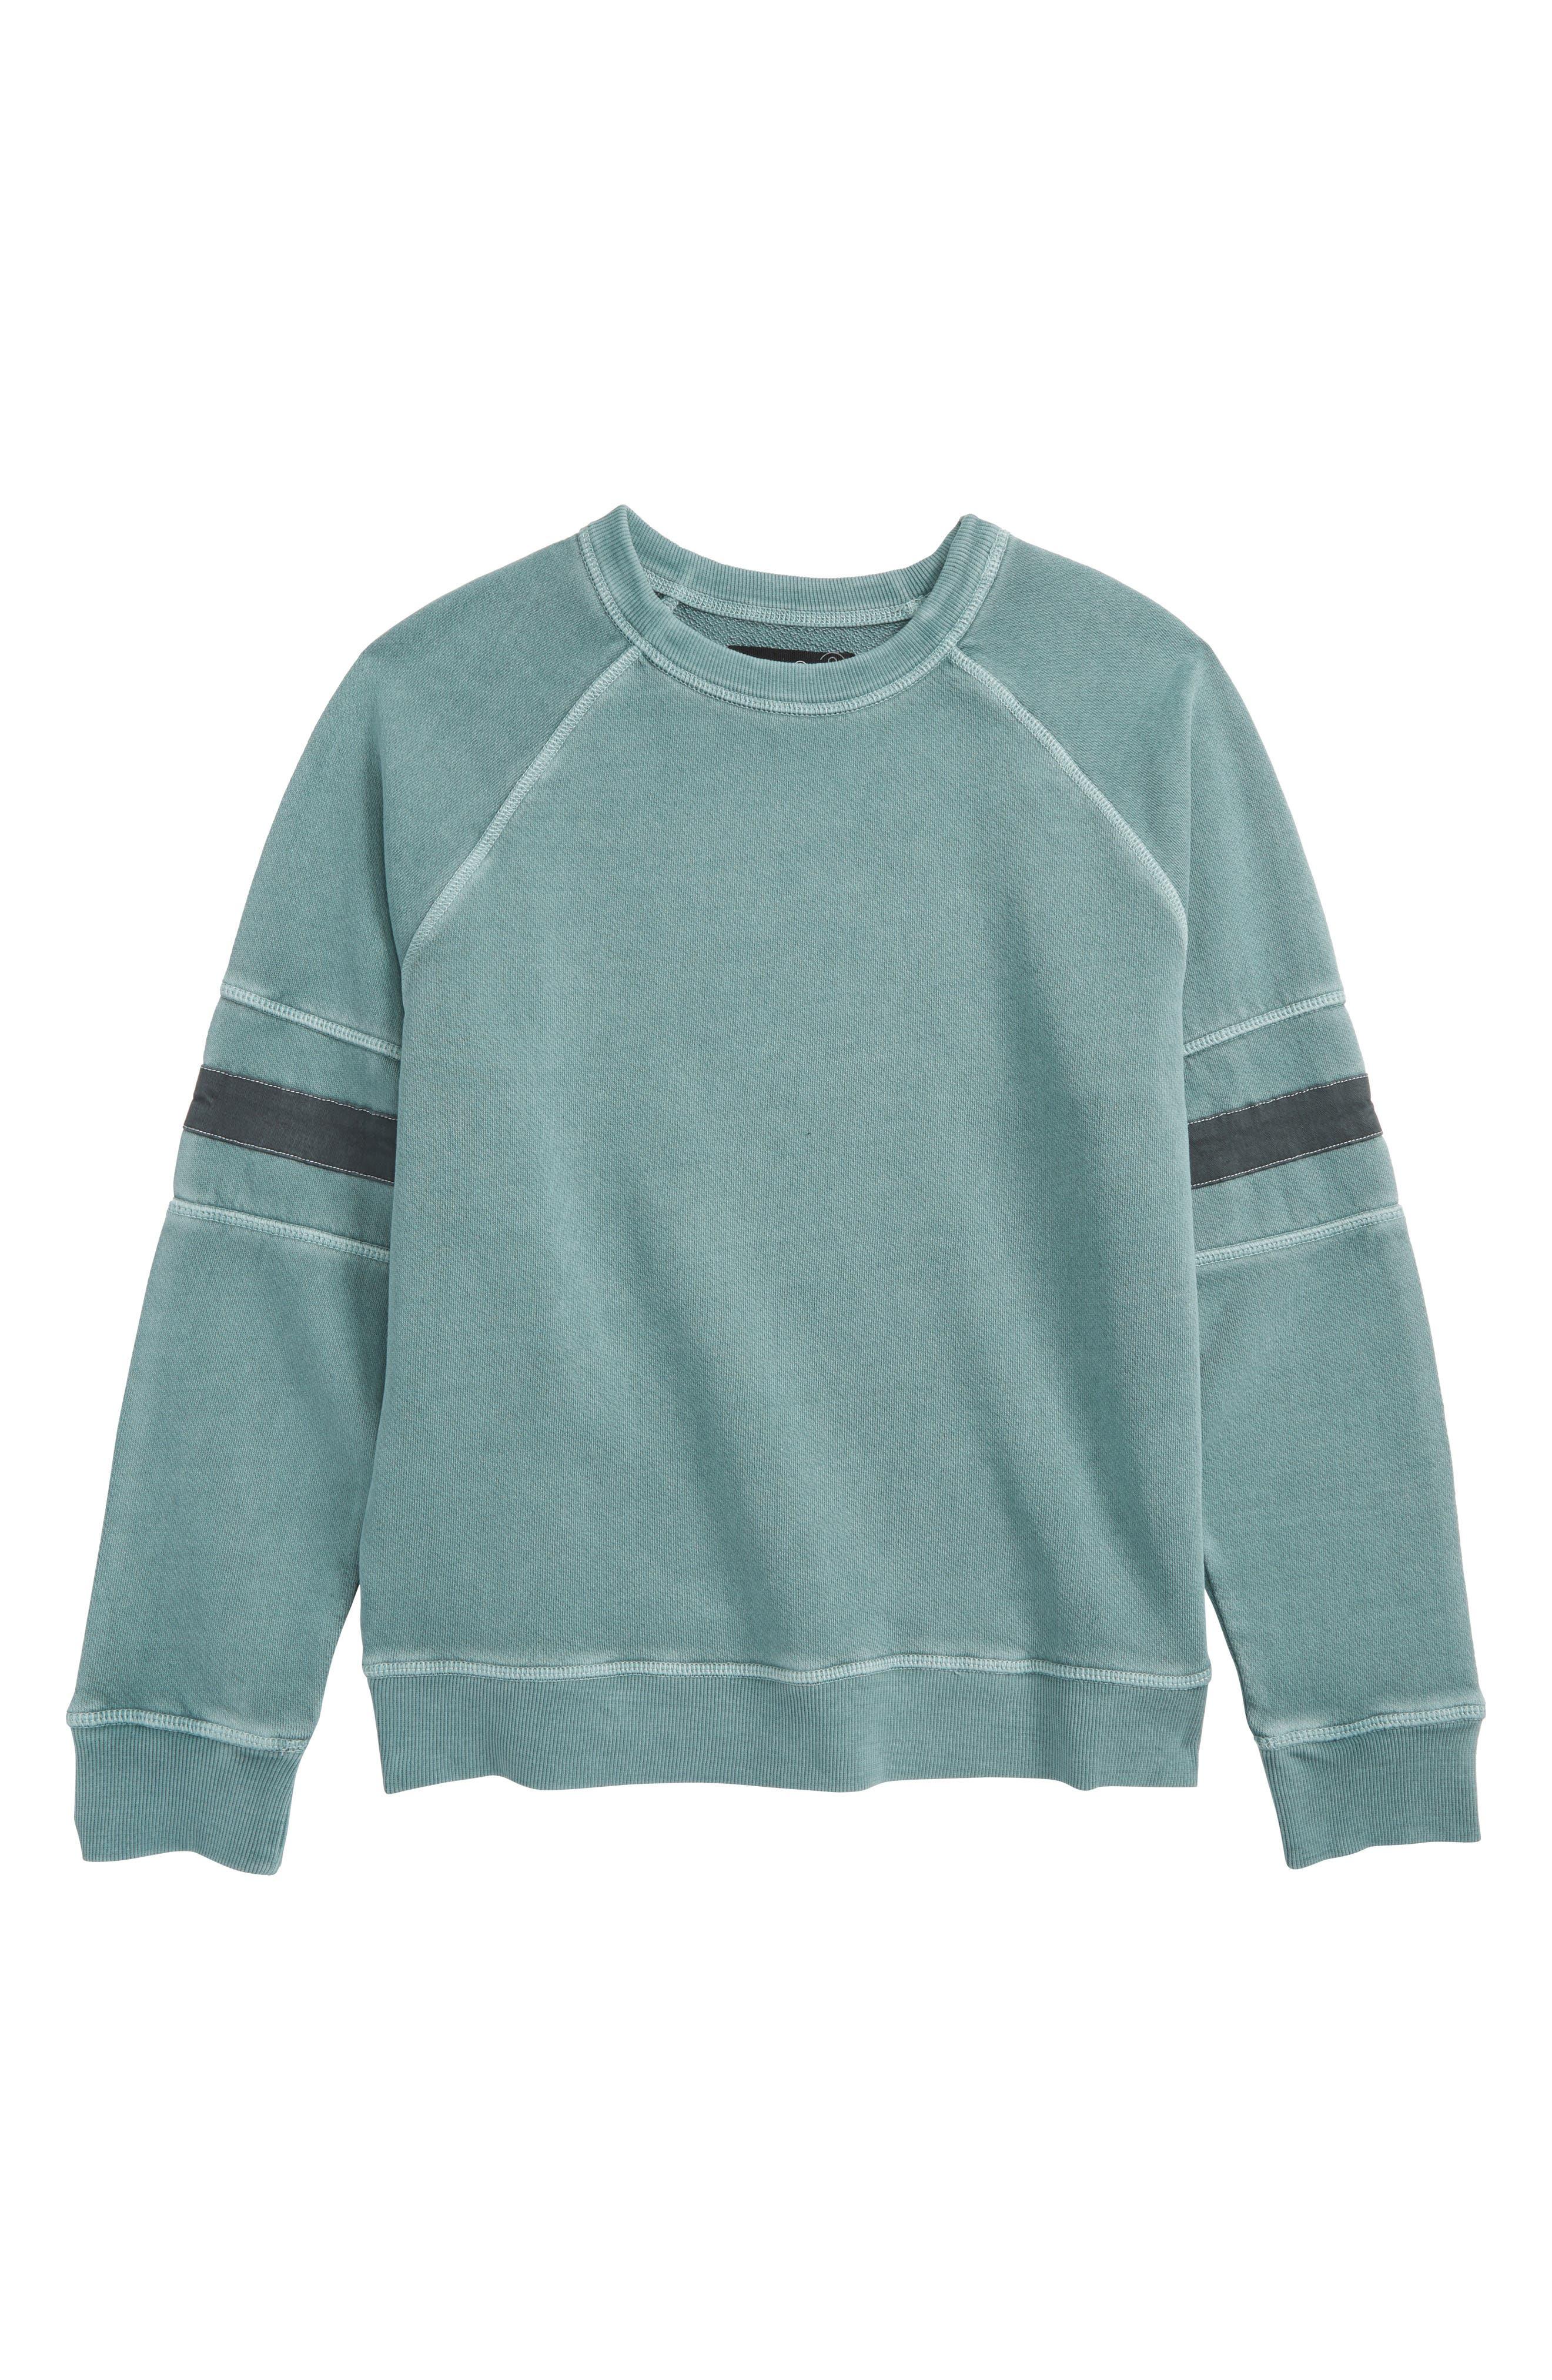 Washed Sweatshirt,                         Main,                         color, 445